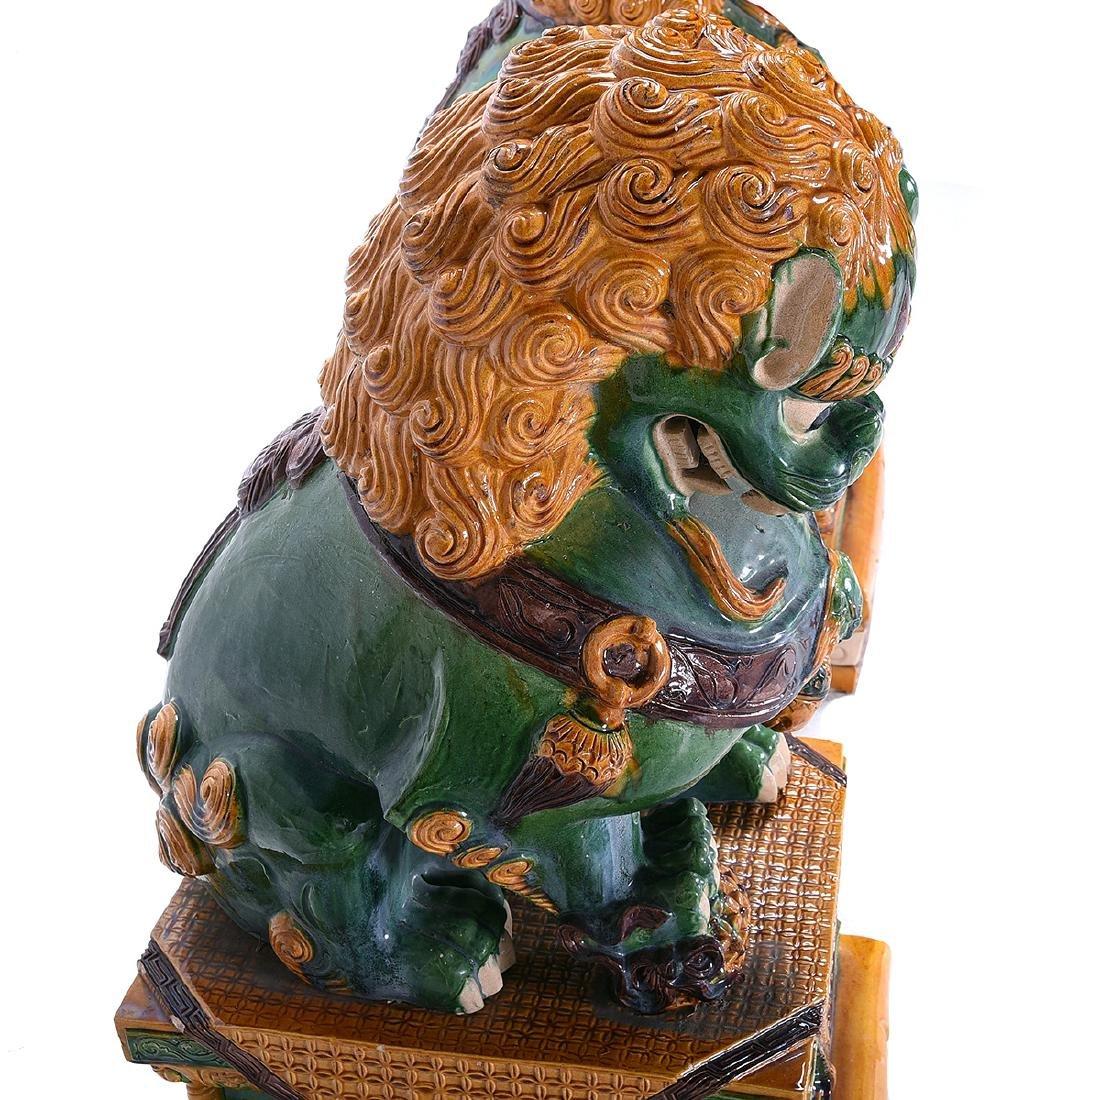 Pair of Massive Glazed Ceramic Guardian Lions - 8